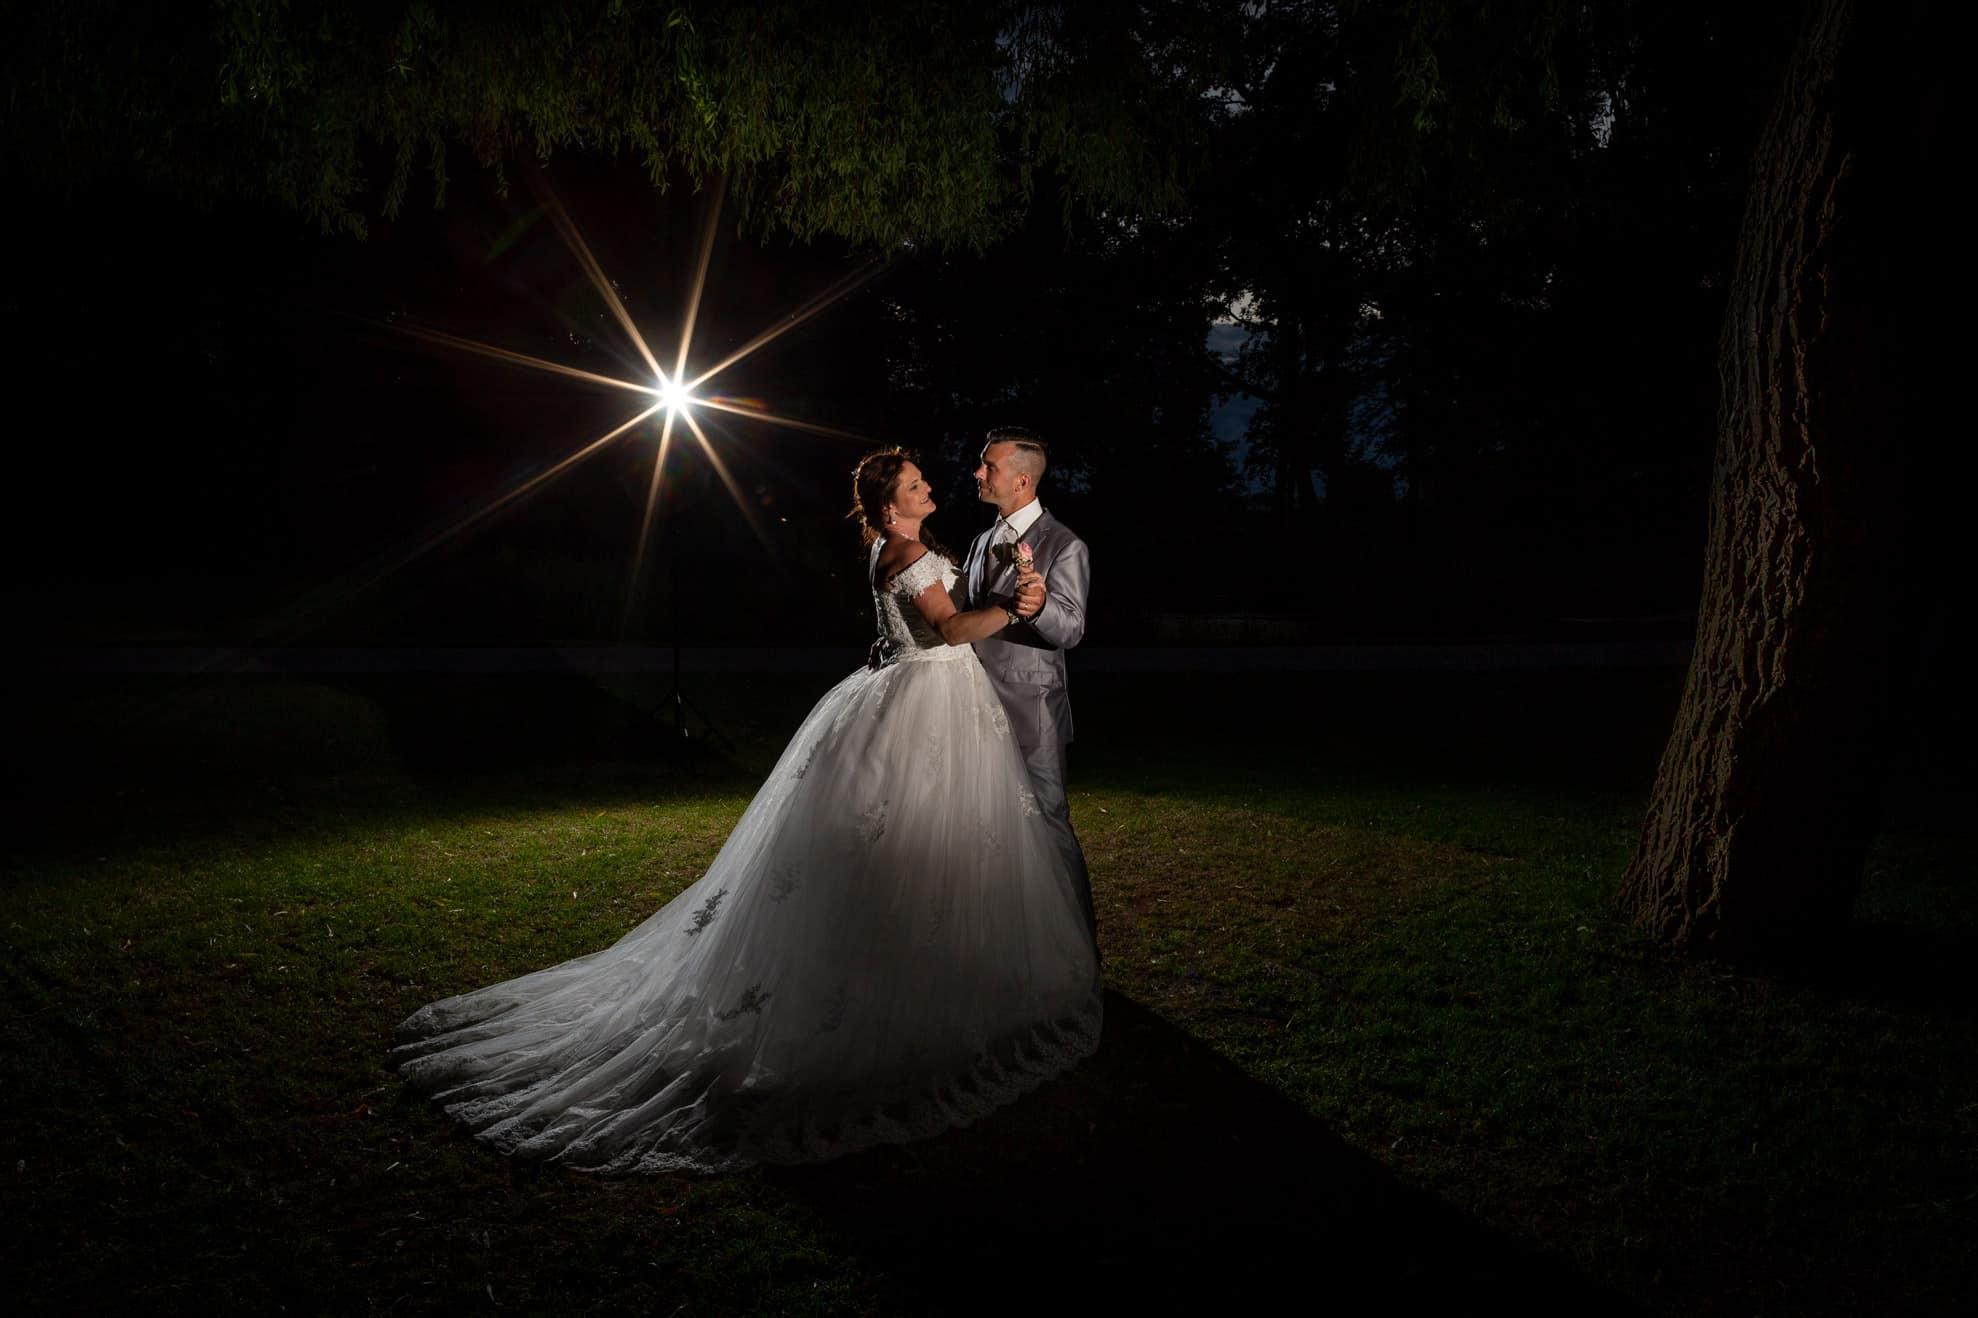 fotografie avond fotoshoot bruidspaar